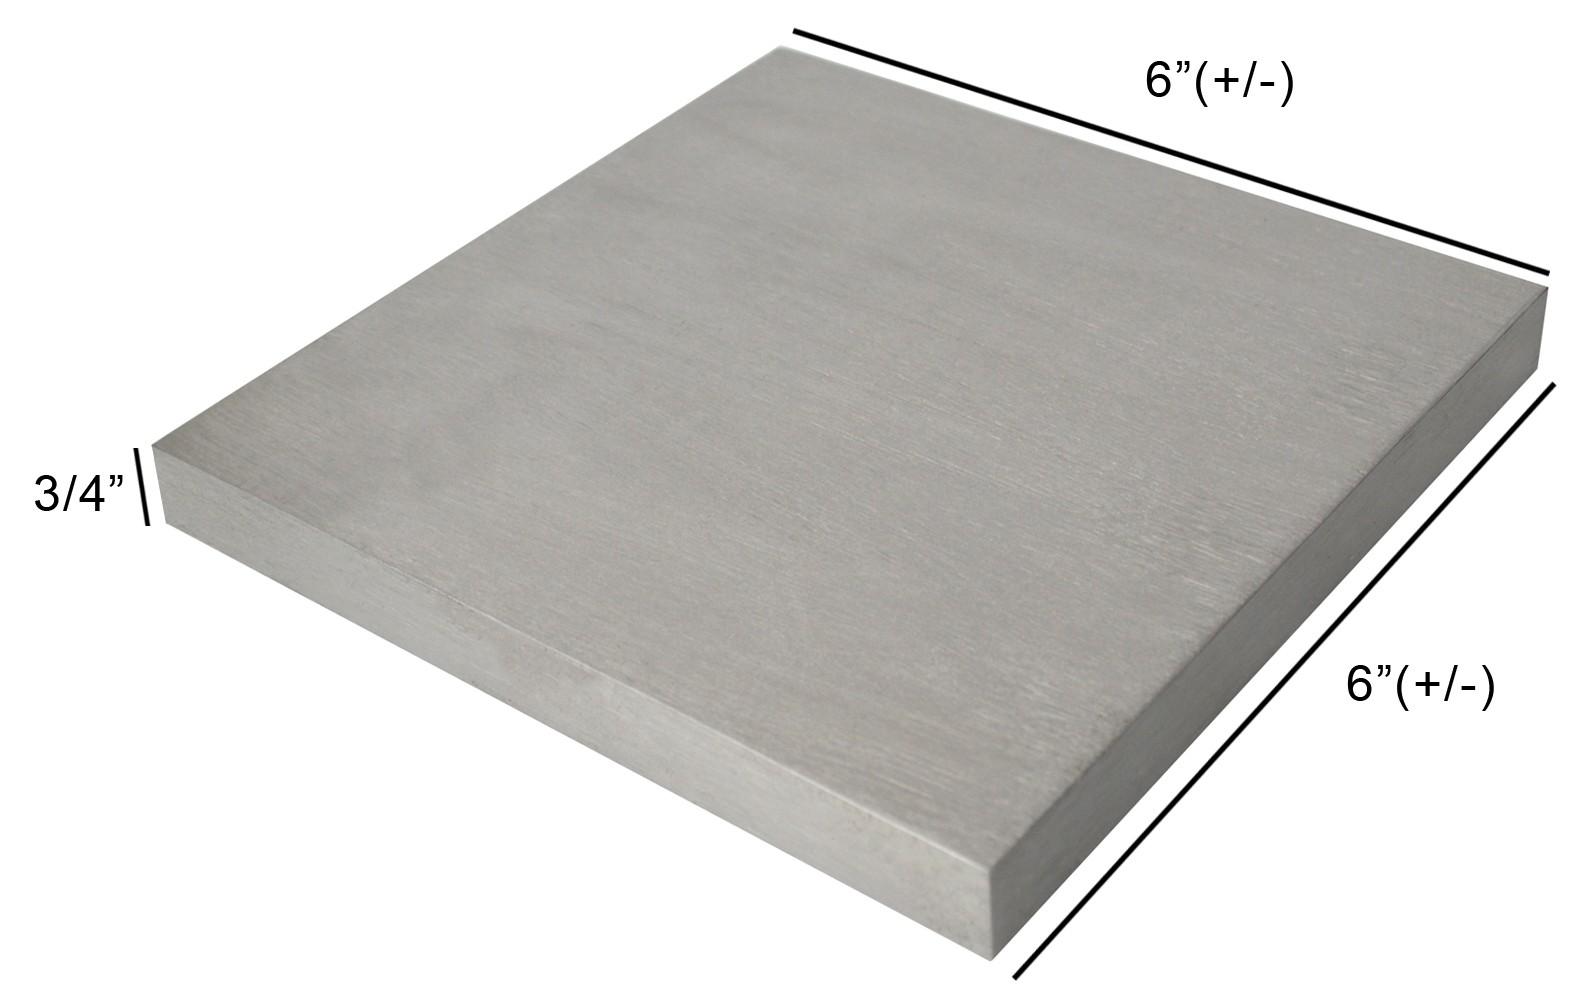 "6"" x 6"" x 3/4"" Steel Bench Block"